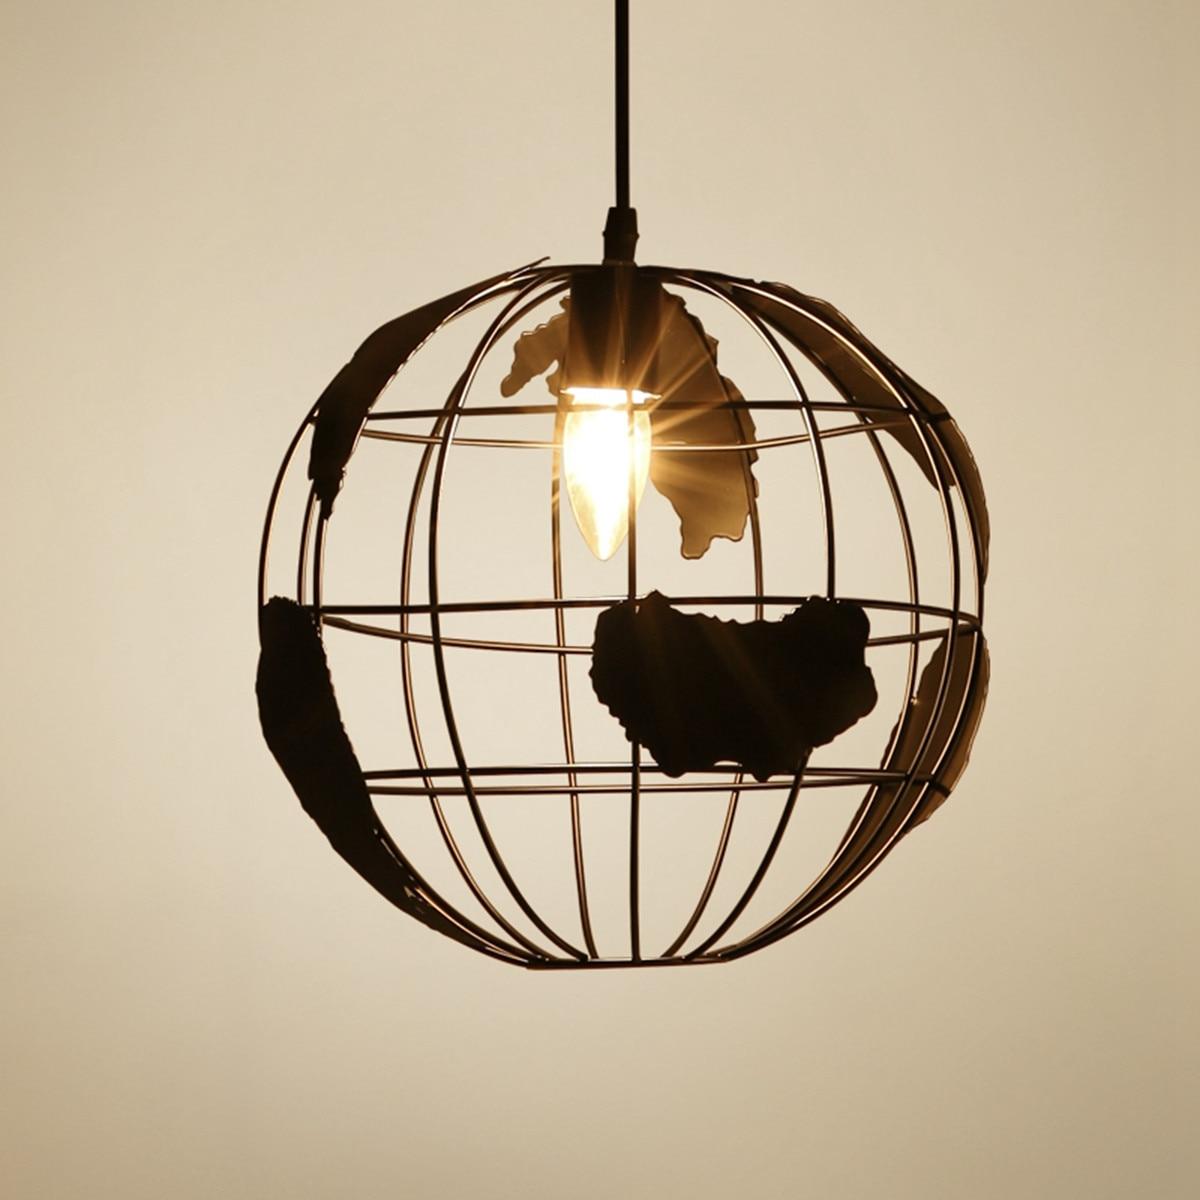 Plate Restaurant Coffee Indoor Home Ceiling Decor E27 Bulb World Map Globe Earth Shaped Hanging Pendant Light